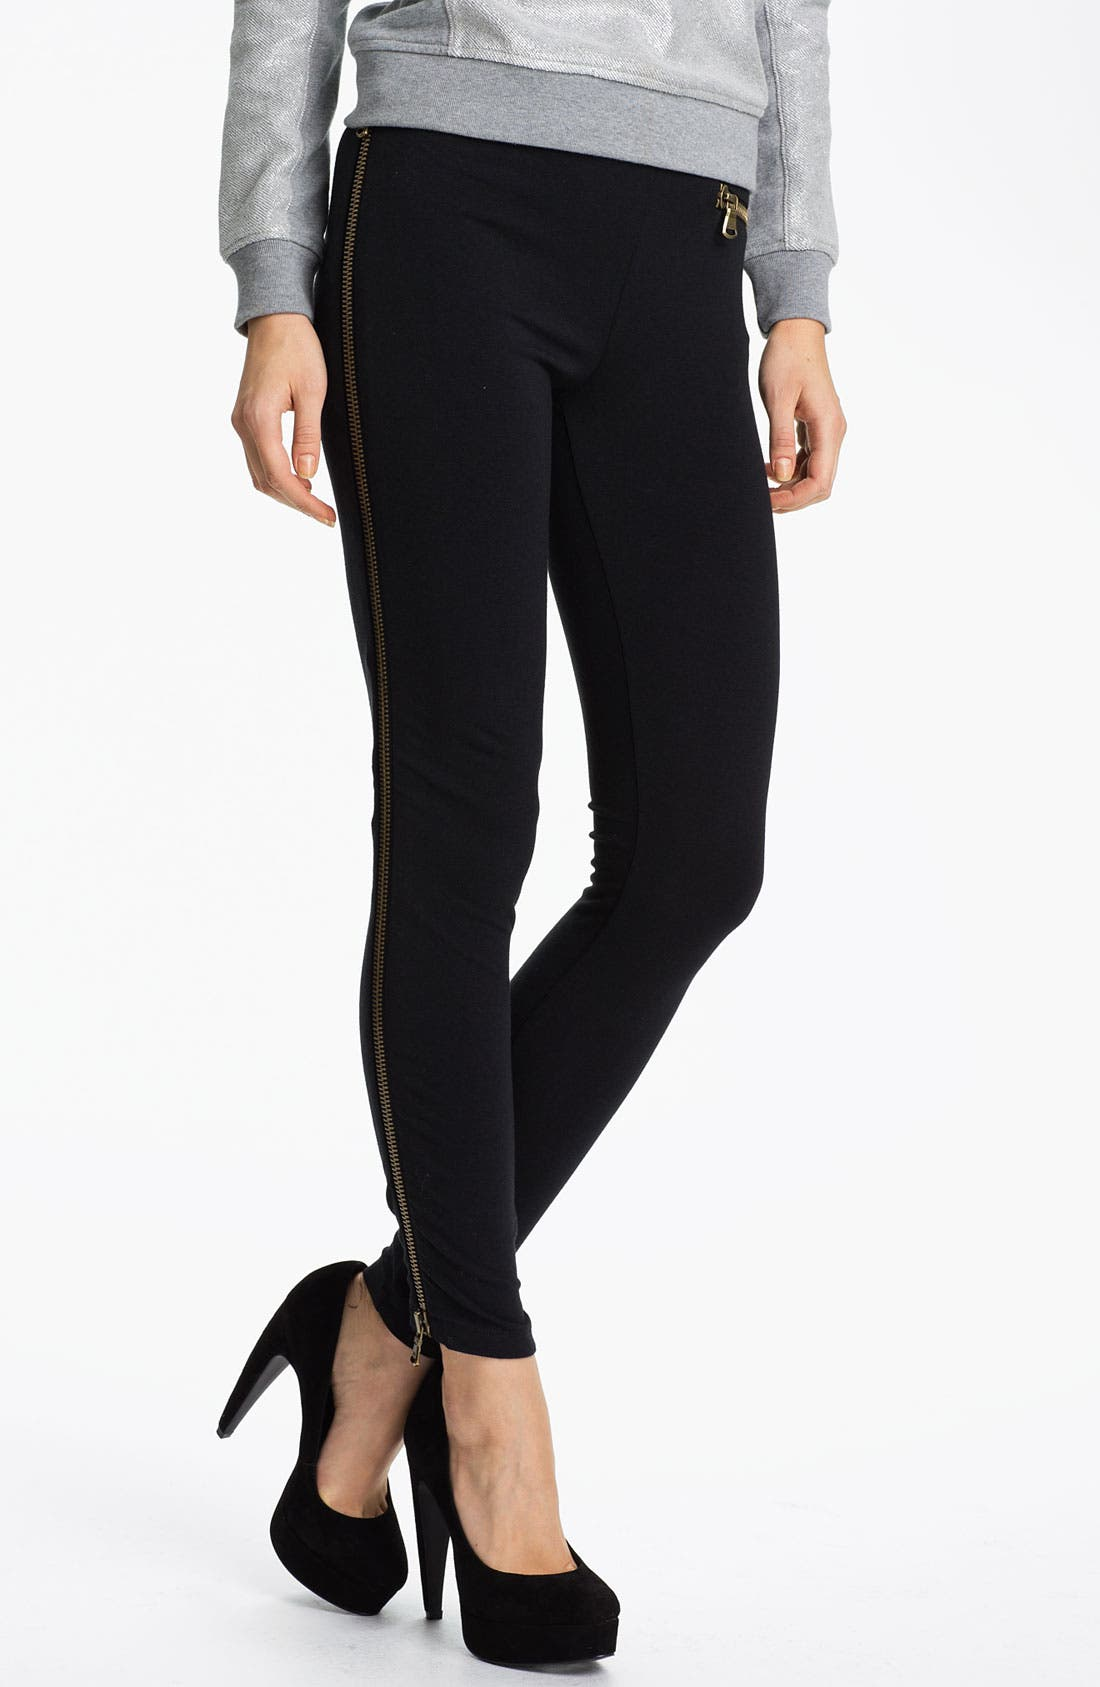 Alternate Image 1 Selected - Hot Sox Side Zipper Leggings